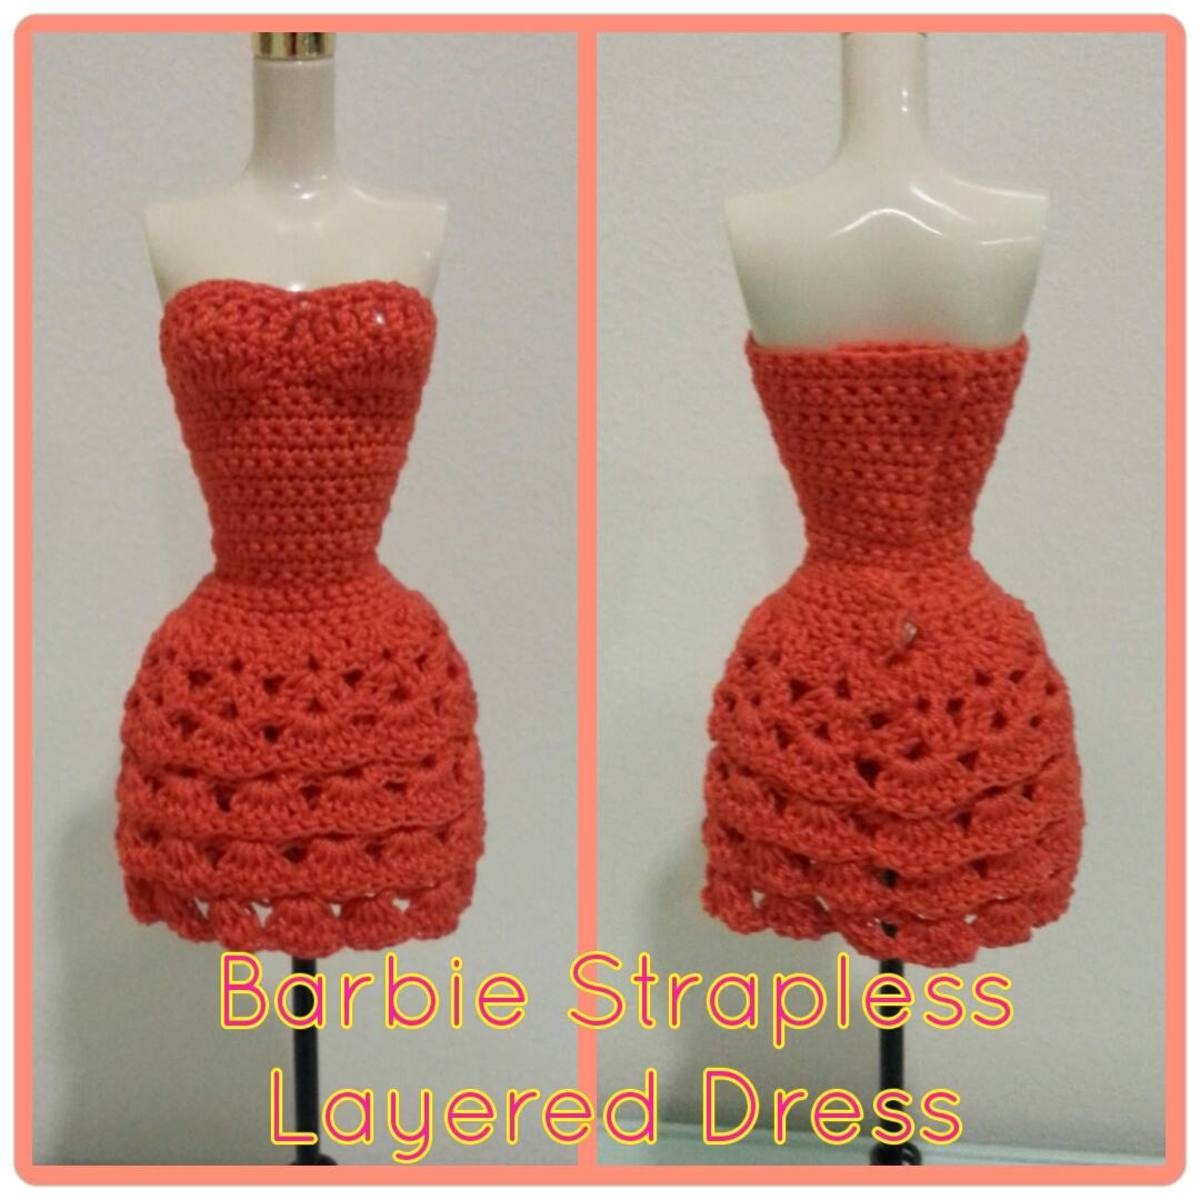 Barbie Strapless Layered Dress (Free Crochet Pattern)